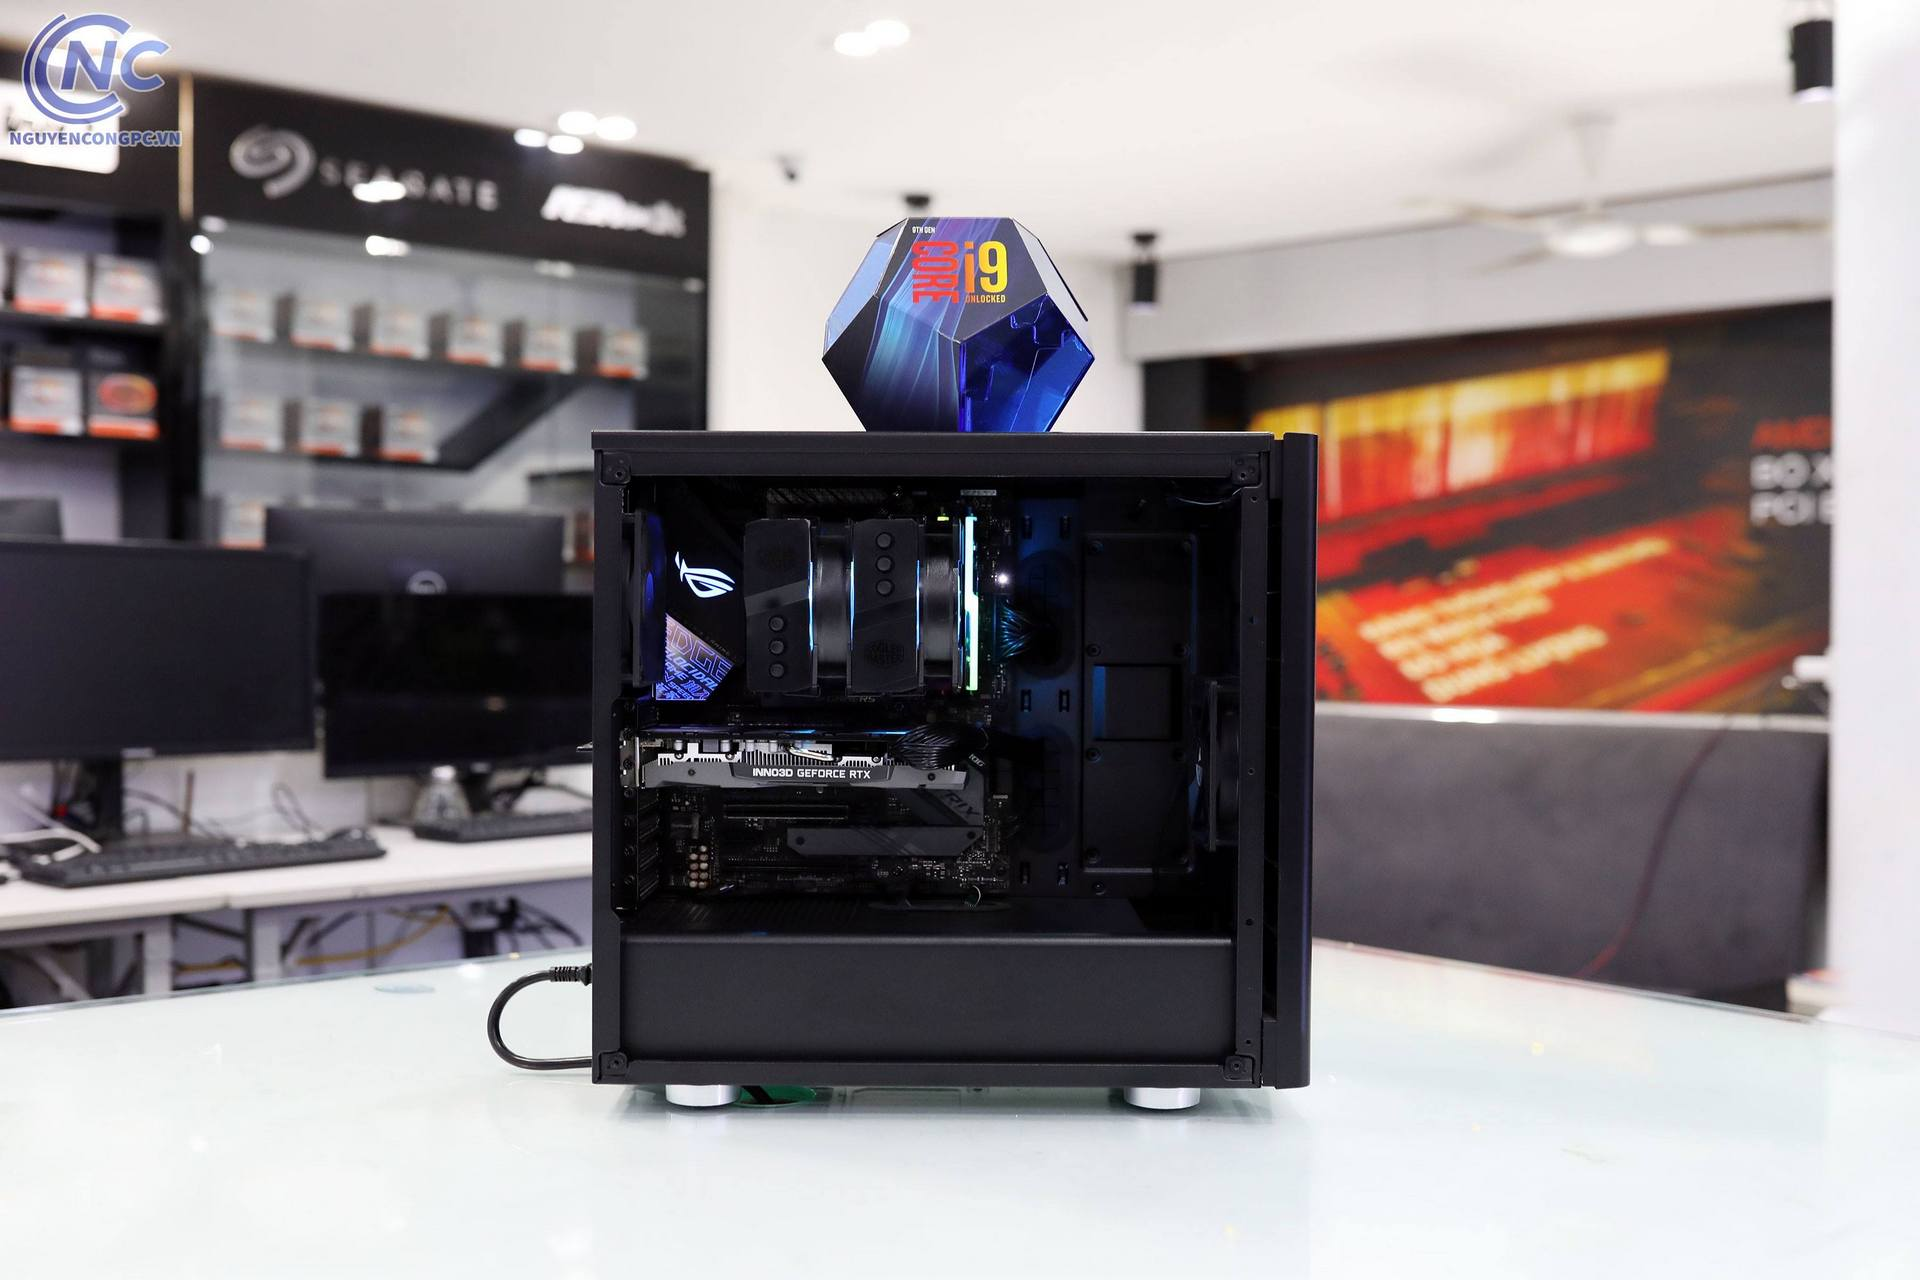 PC Intel Core i9 9900K | RAM 32G | RTX 2060 | NVMe